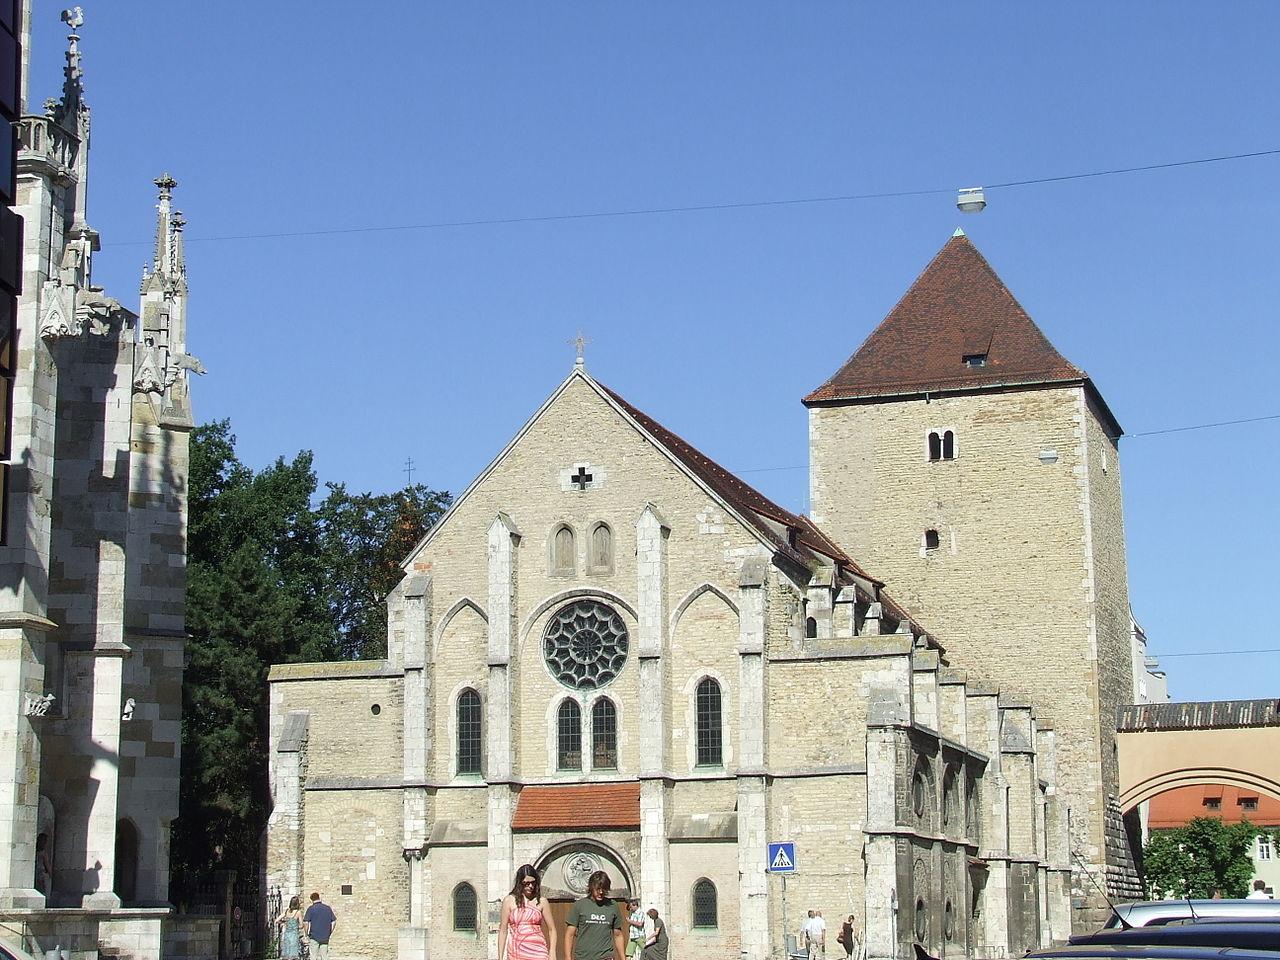 Bild Domschatzmuseum Regensburg